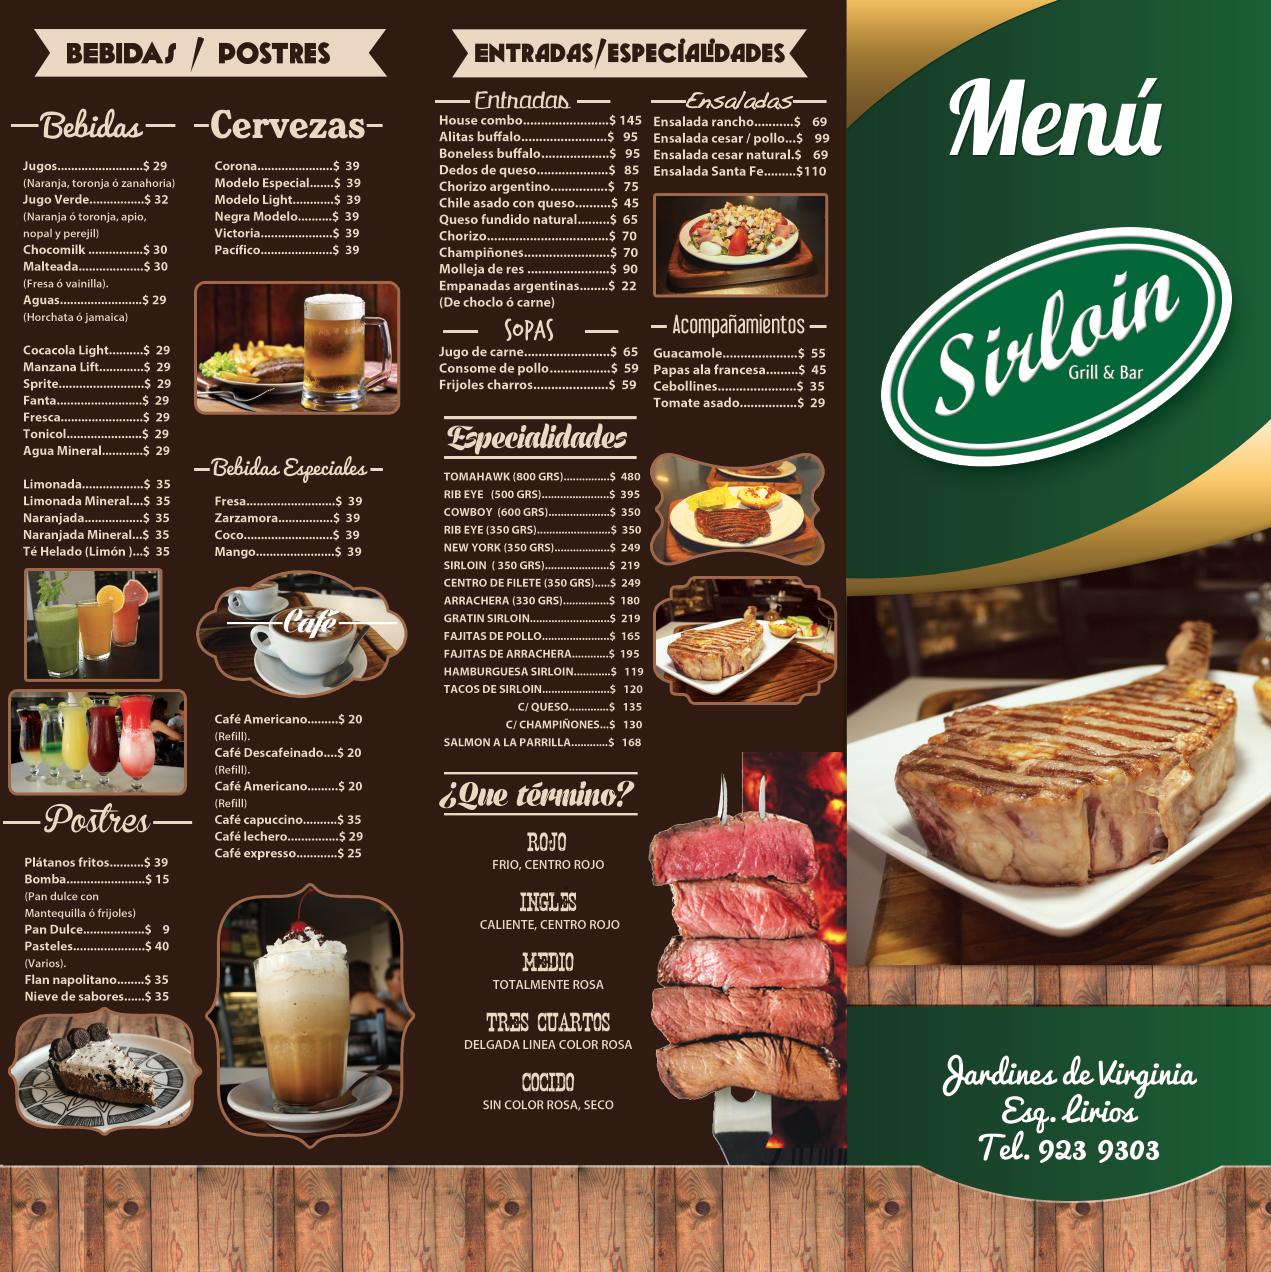 Dise o y fotograf as de alimentos de men para sirloin for Disenos de menus para cafeterias